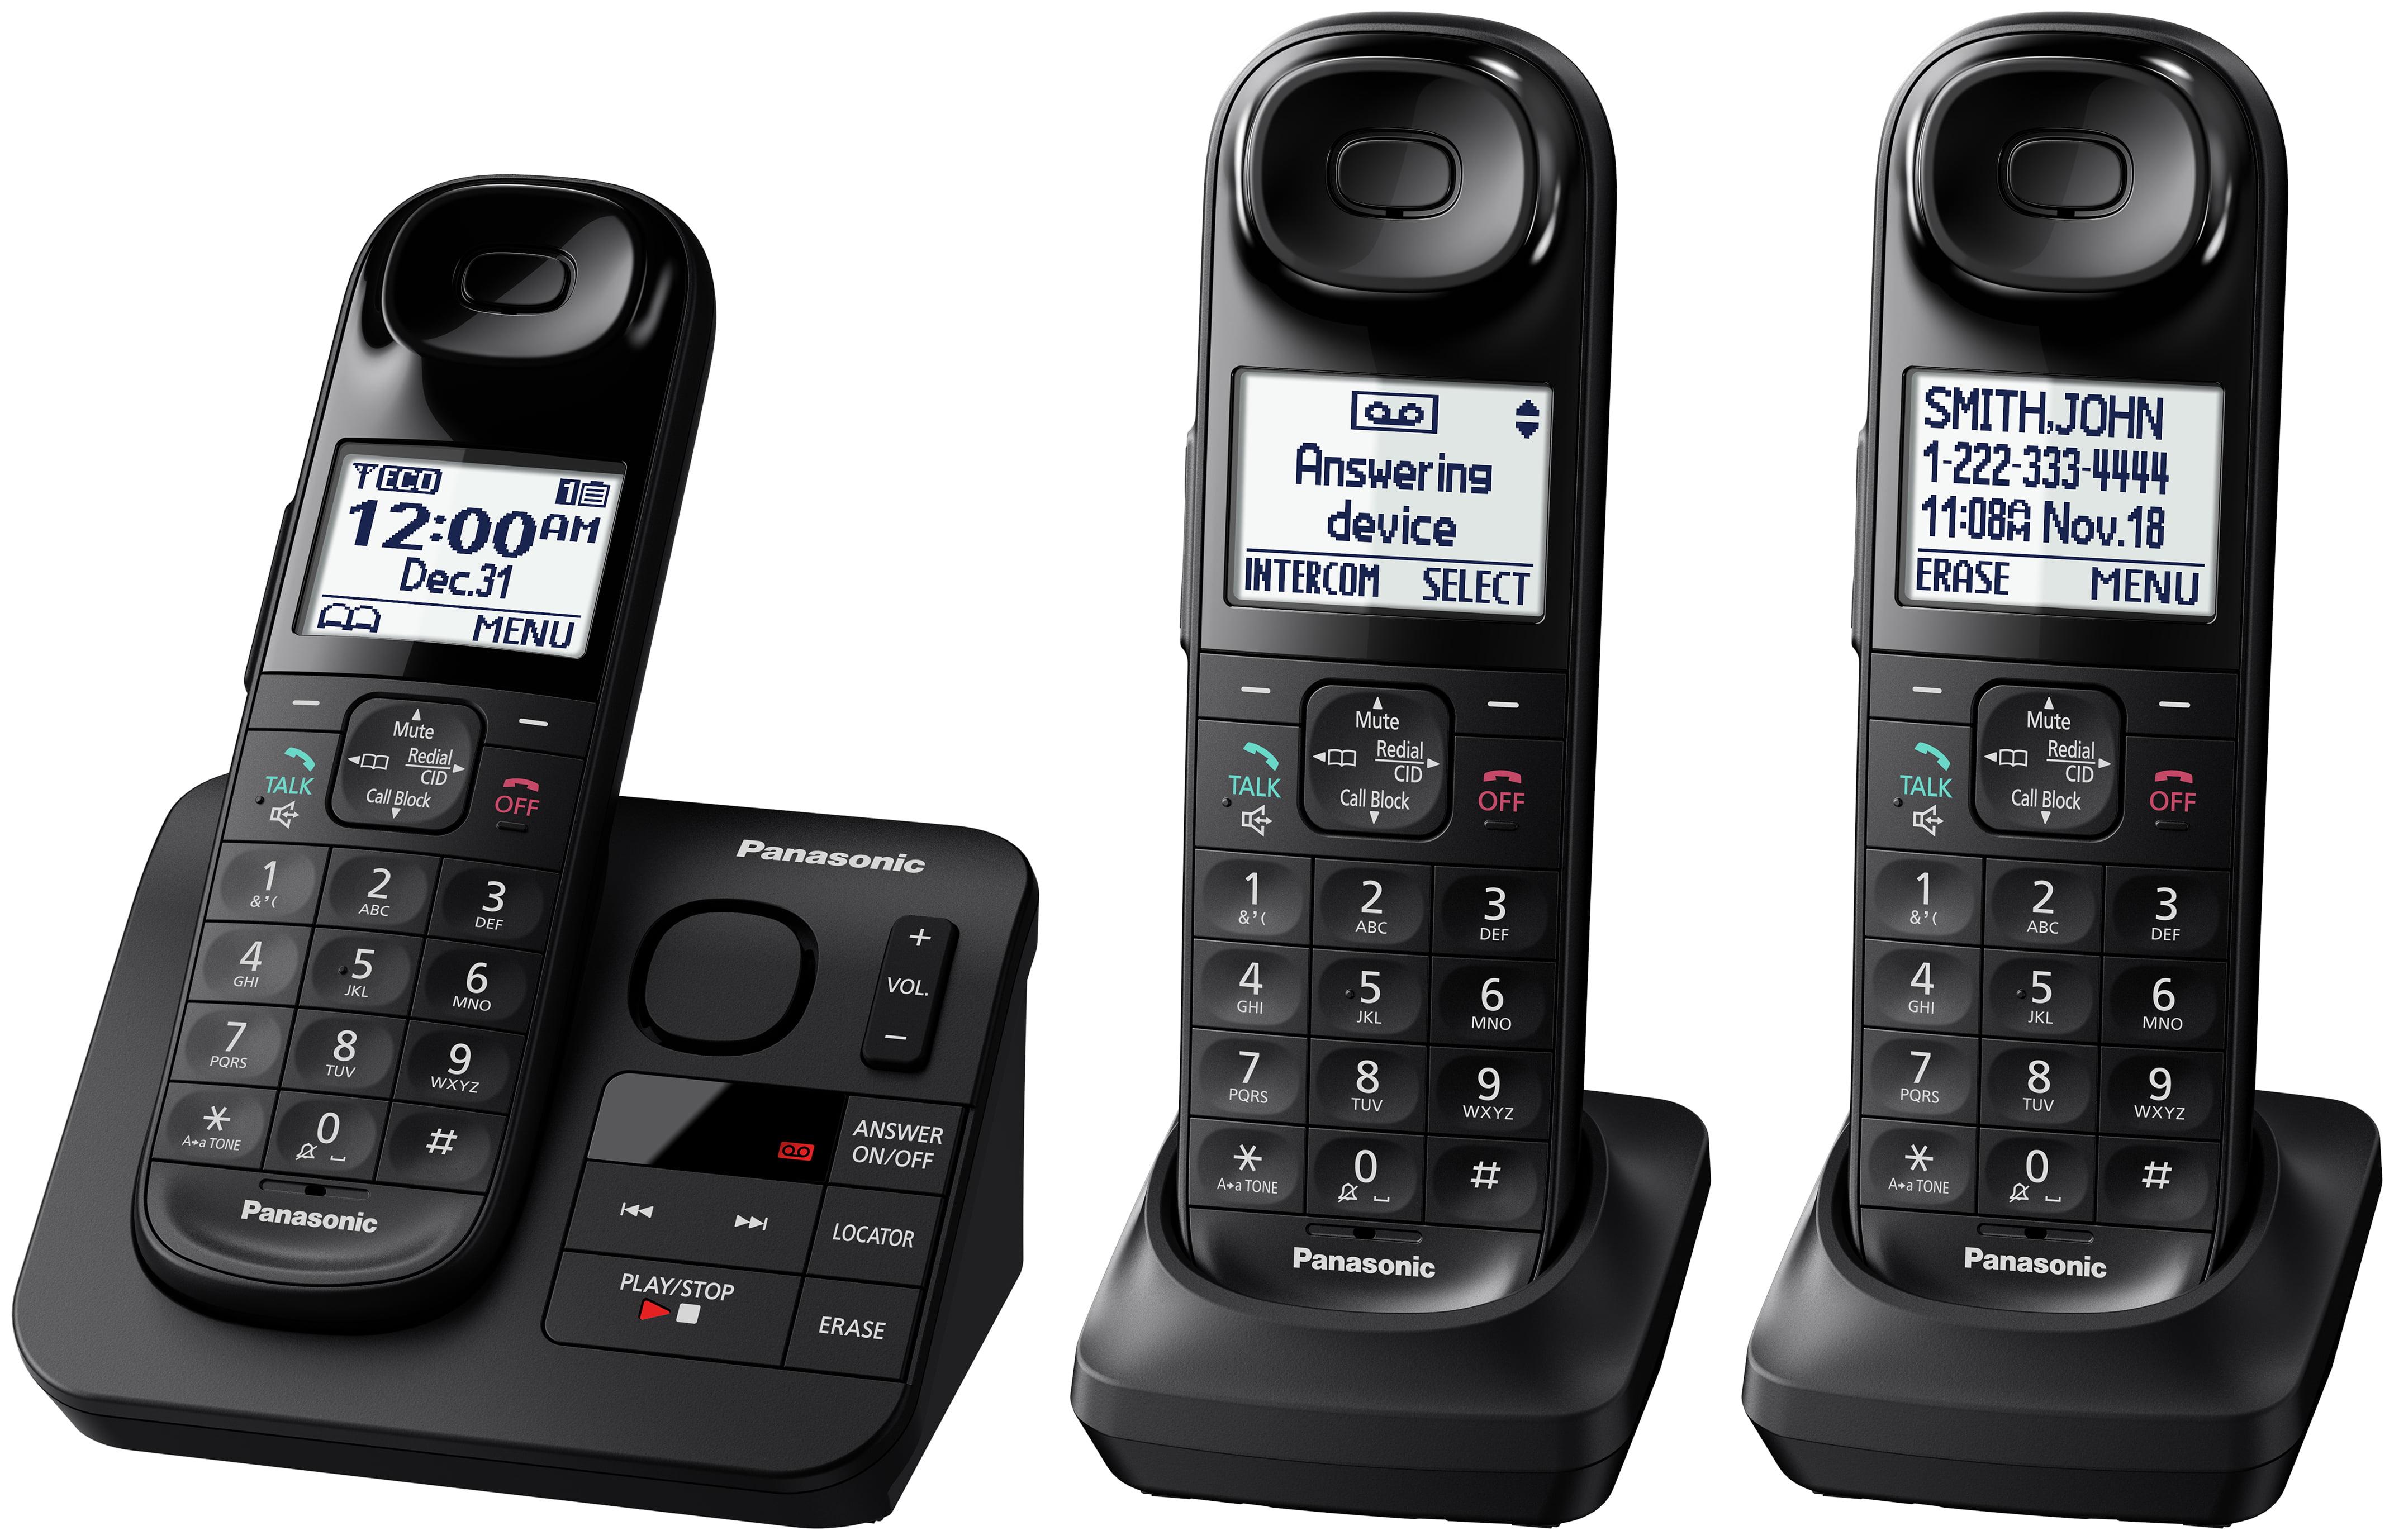 Panasonic Black Cordless Telephone With 3 Handsets And Answering Machine